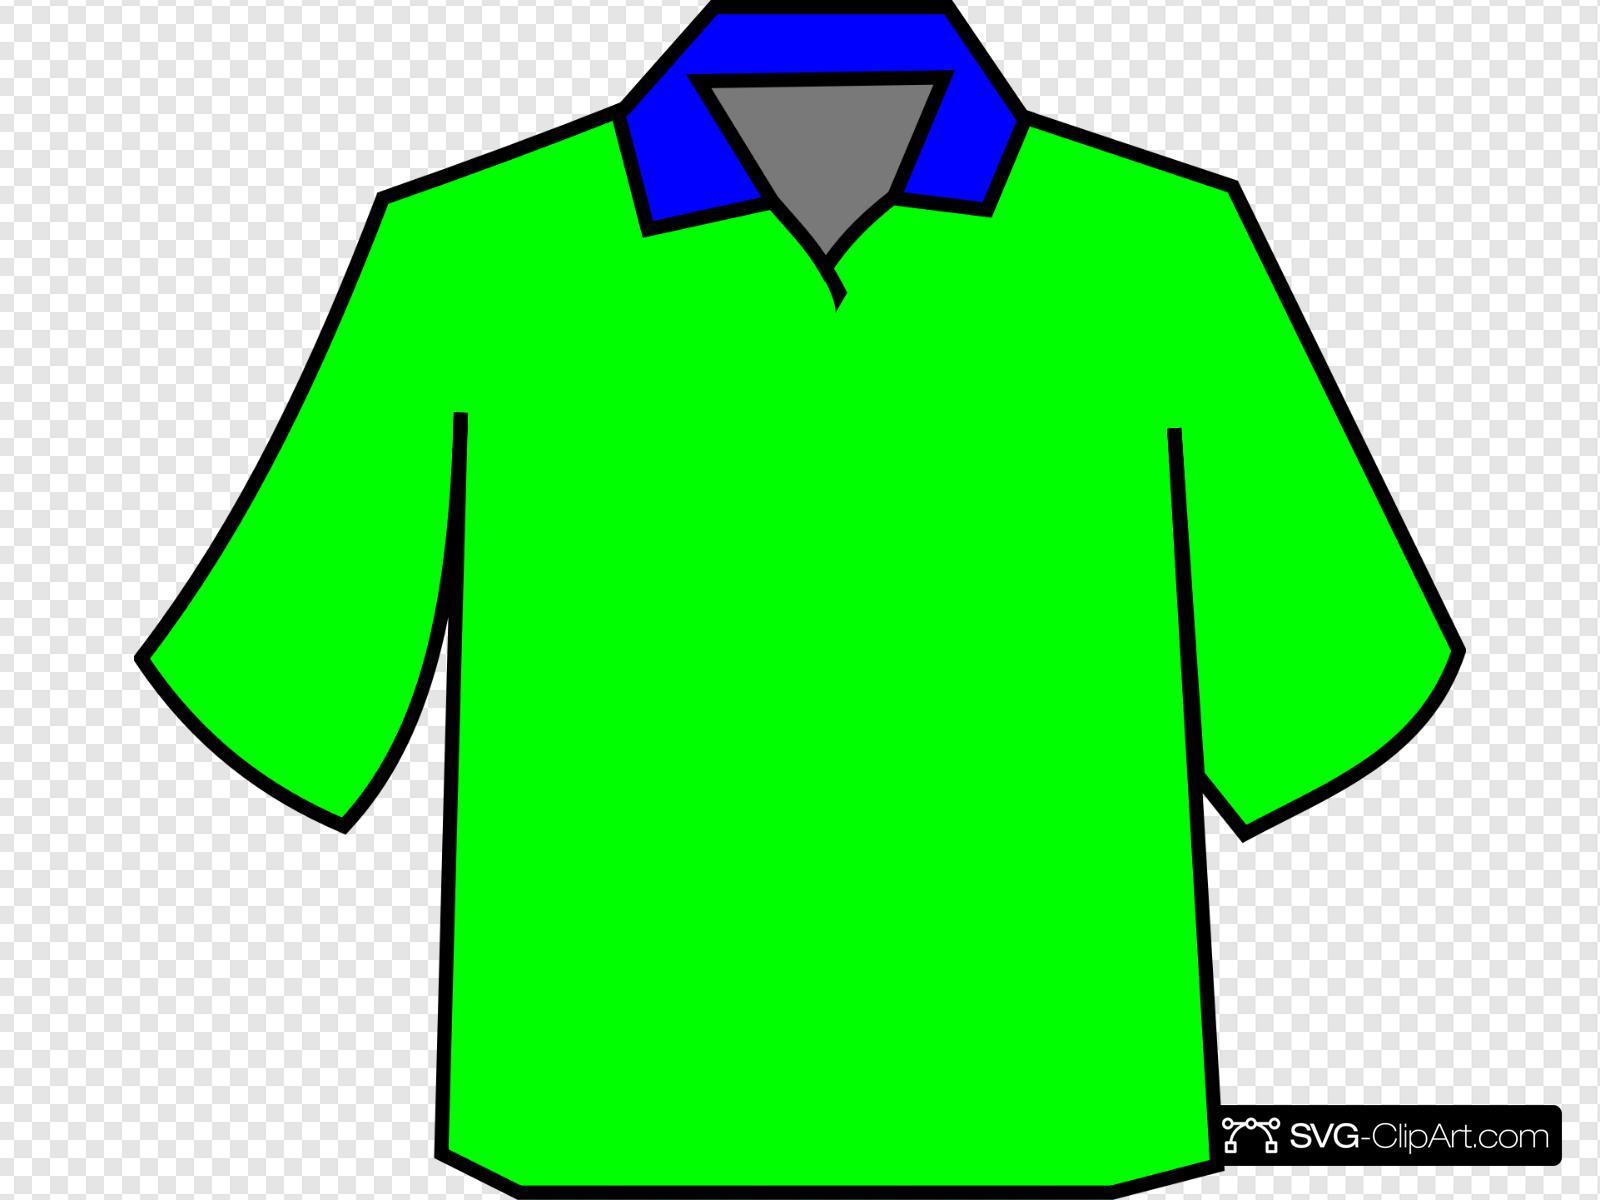 Green Polo Clip art, Icon and SVG.